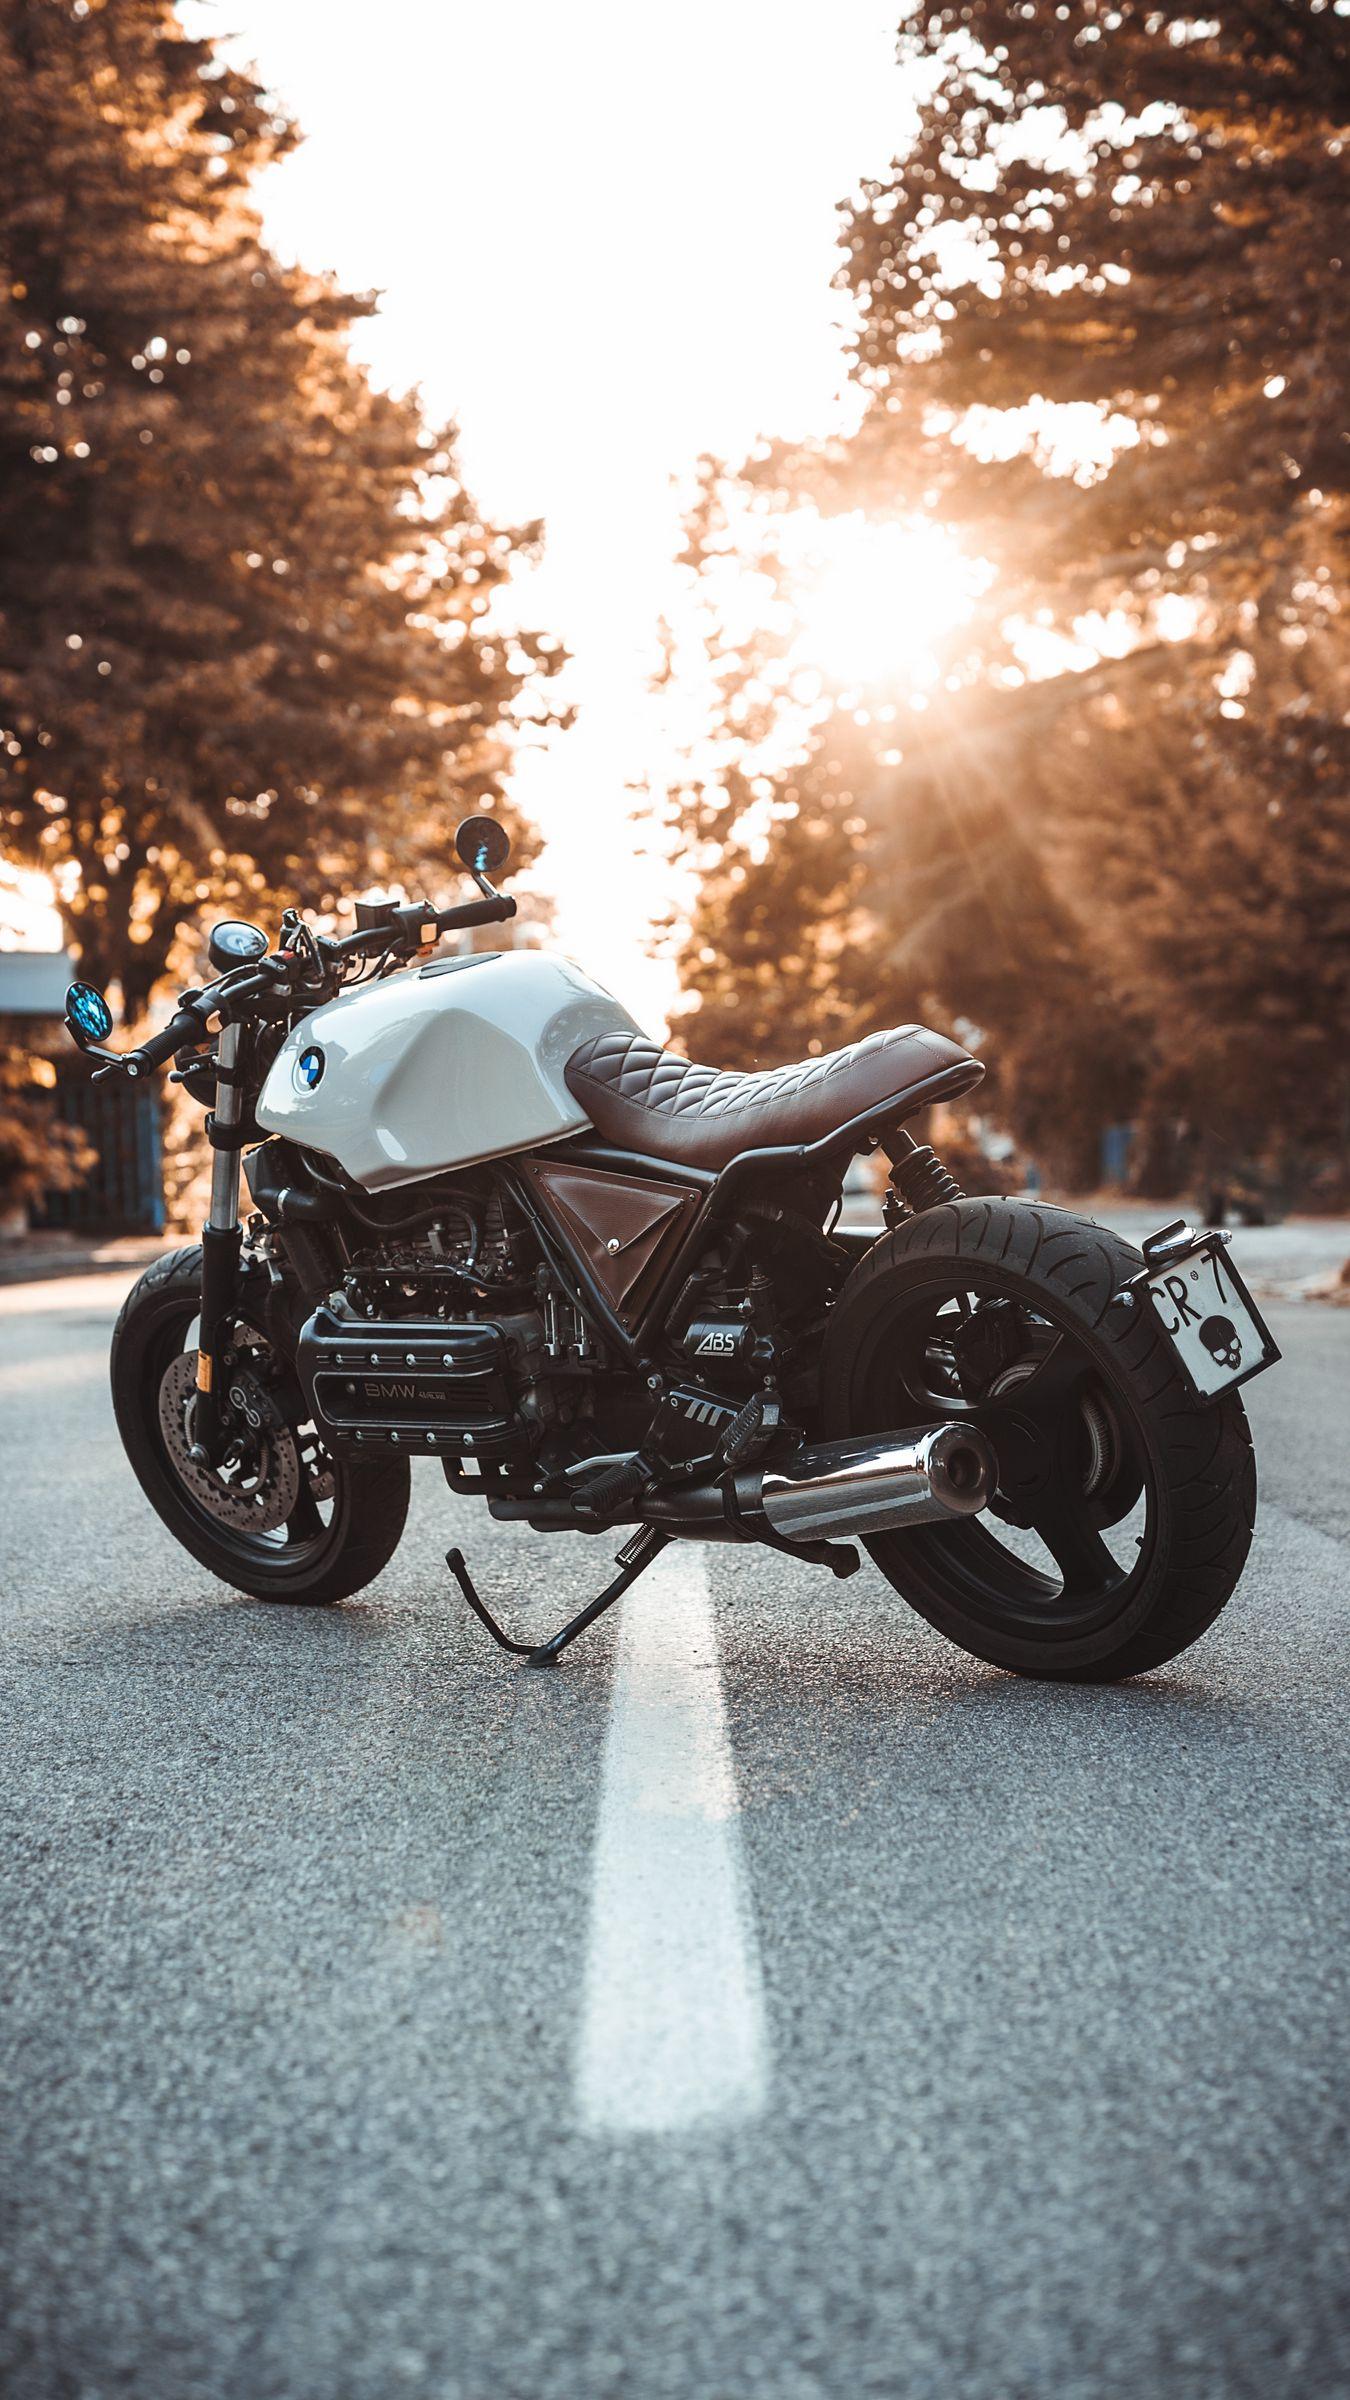 1350x2400 Обои bmw k100, мотоцикл, байк, вид сбоку